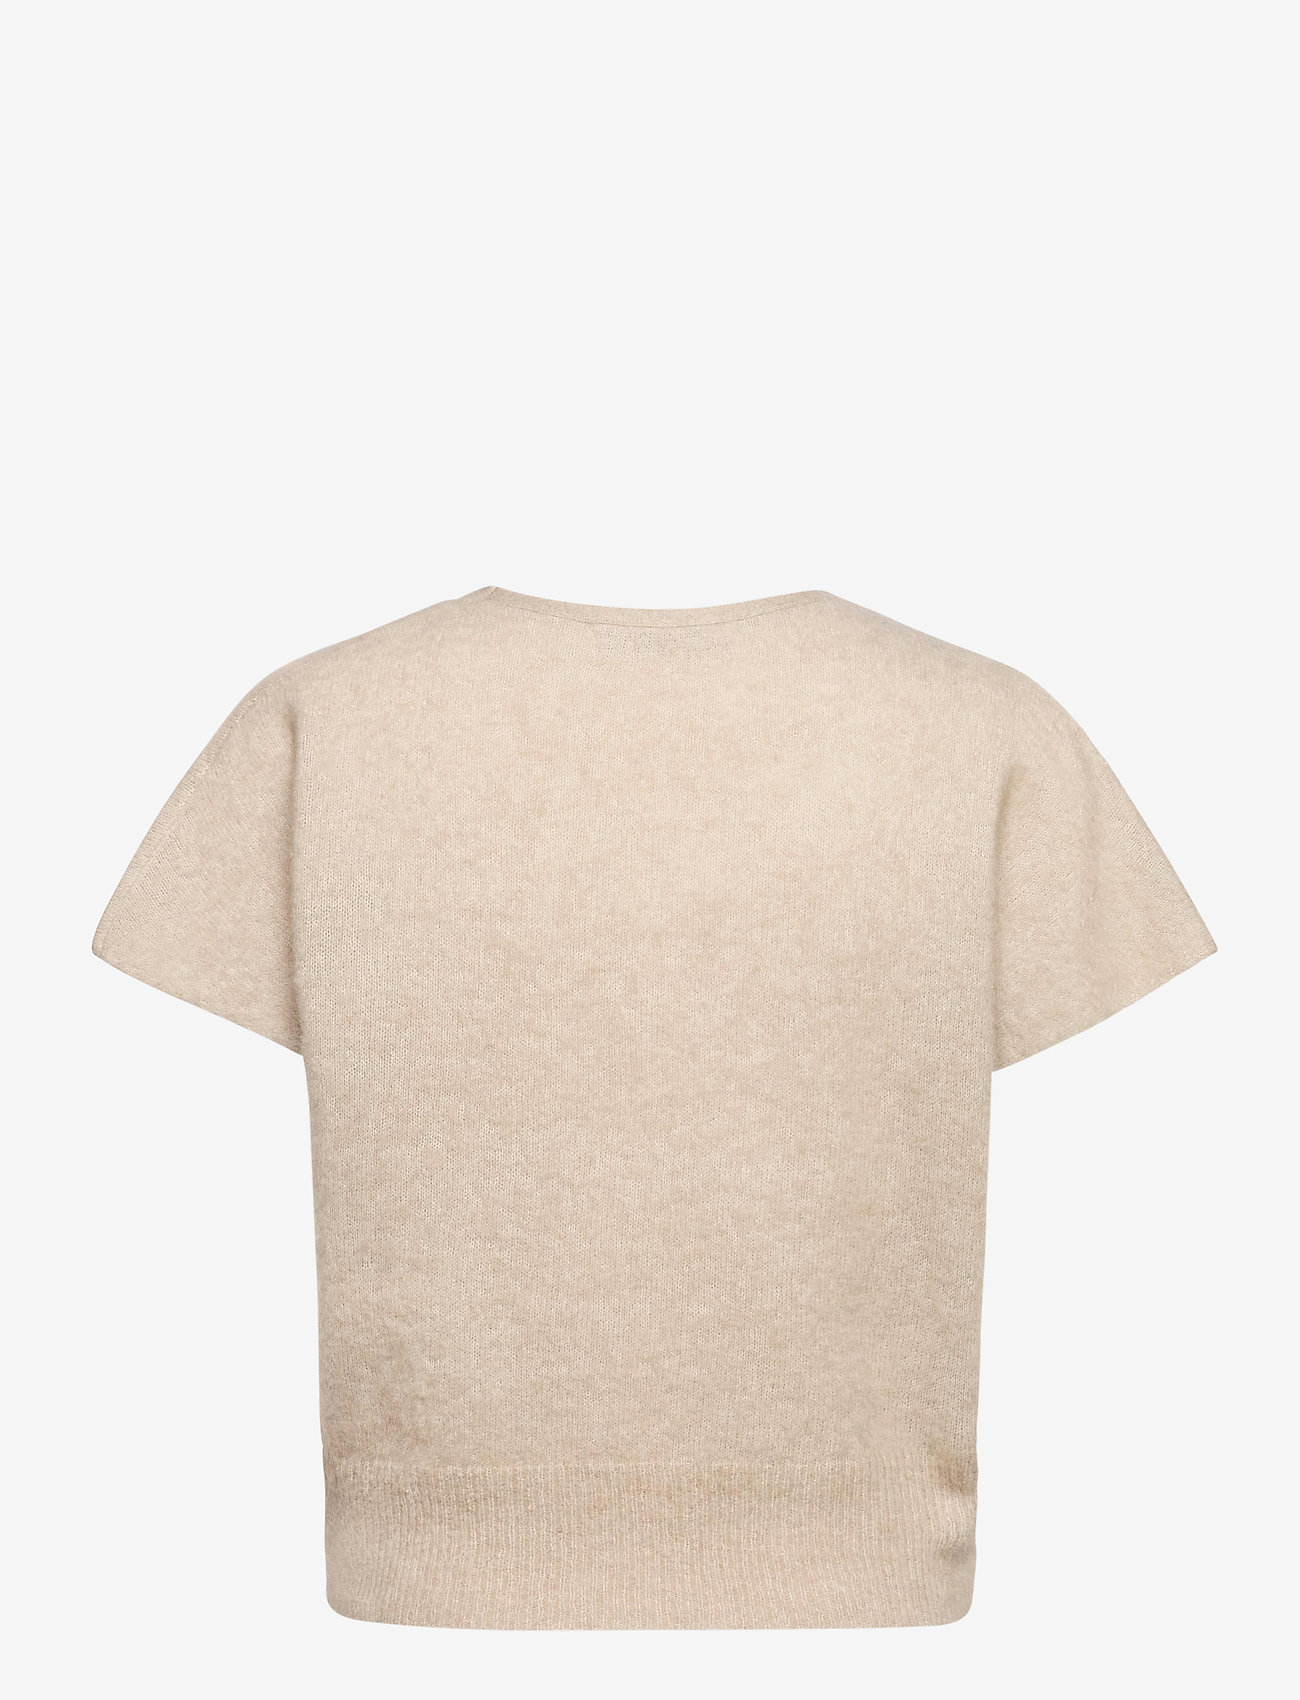 Cathrine Hammel - Soft wide sleeveless top - strikkede toppe - warm grey - 1